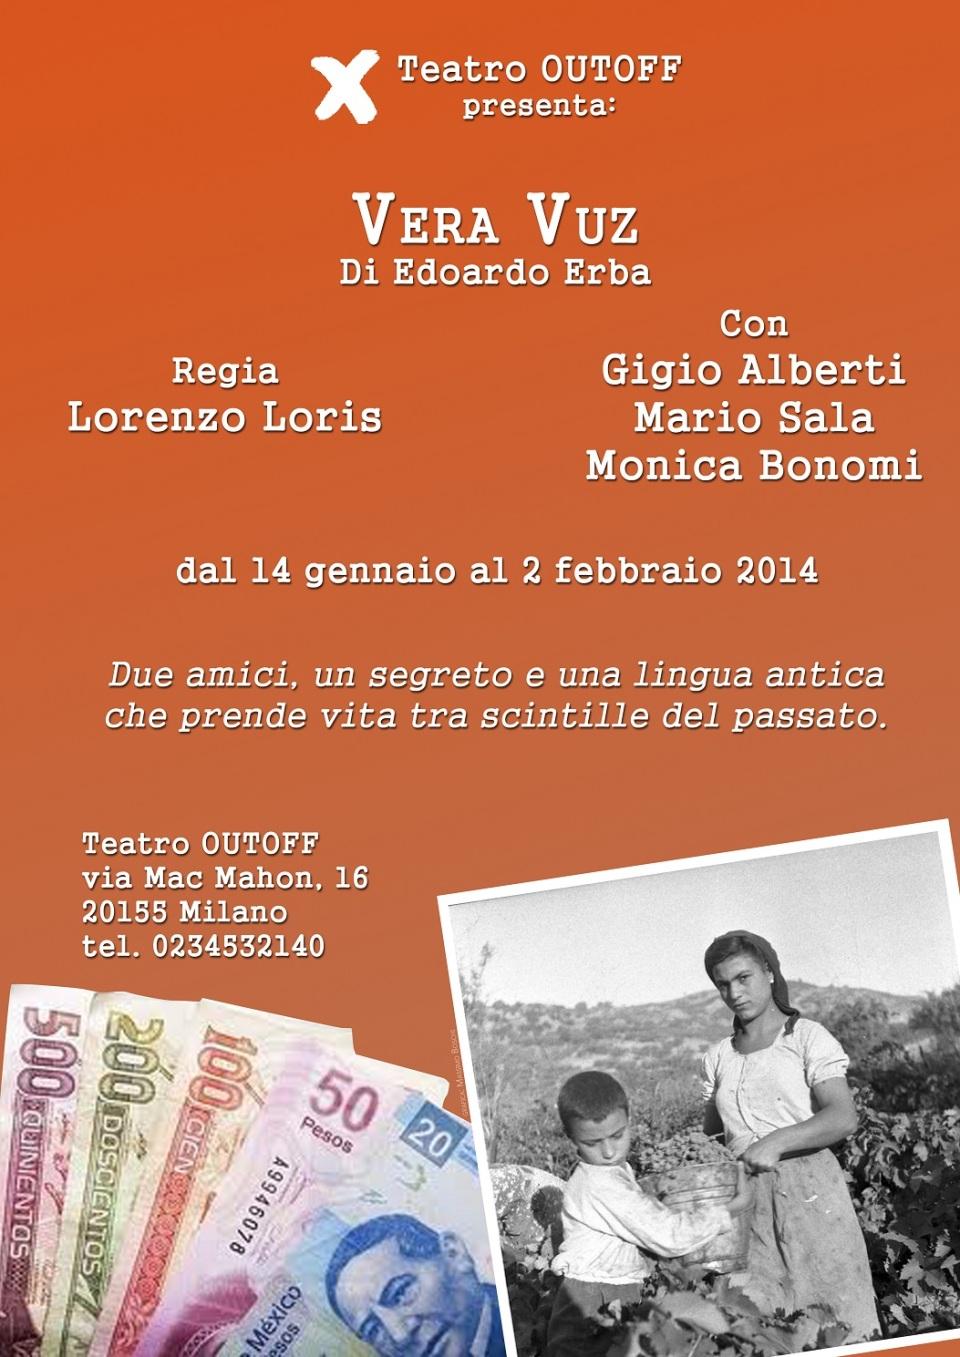 locandina vera vuz #monicabonomi teatro out off @outoff edoardo erba lorenzo loris